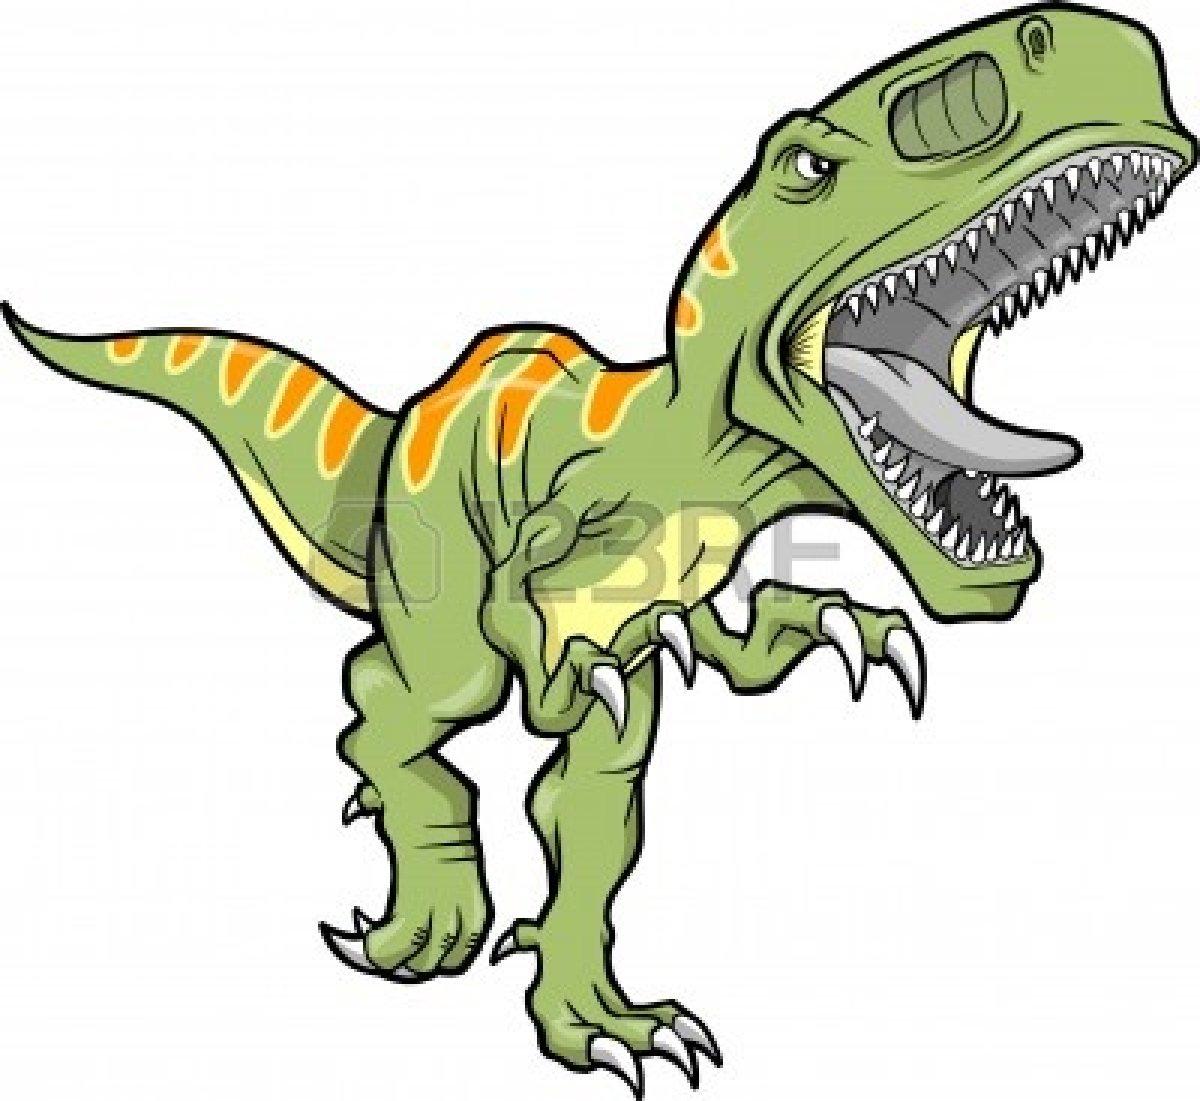 T Rex Dinosaur Clip Art-t rex dinosaur clip art-9